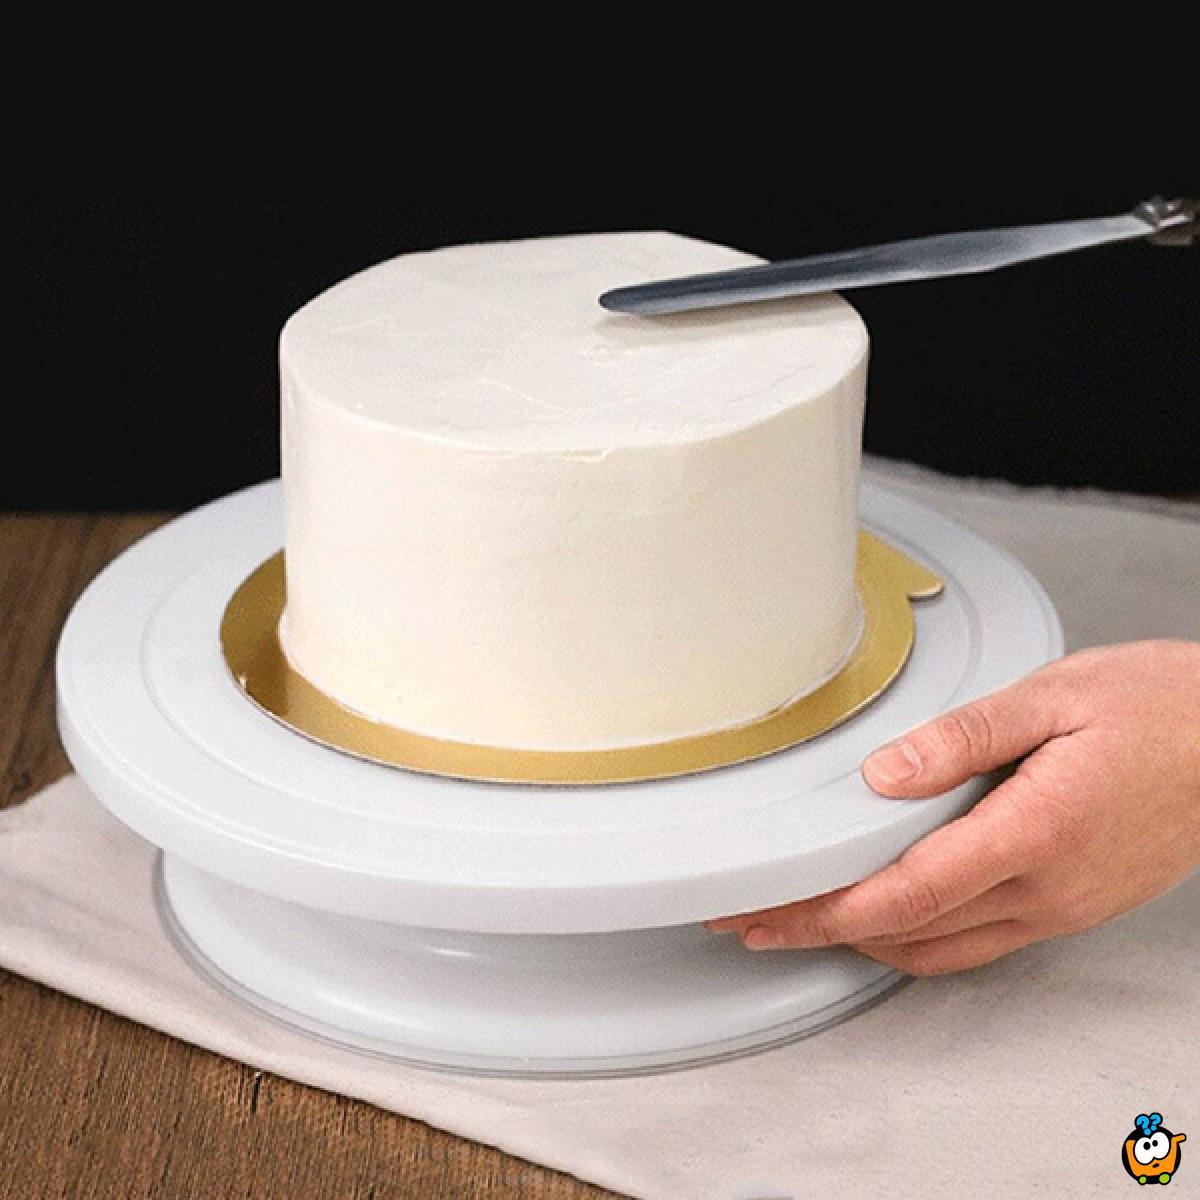 Neklizajući rotacioni stalak za torte